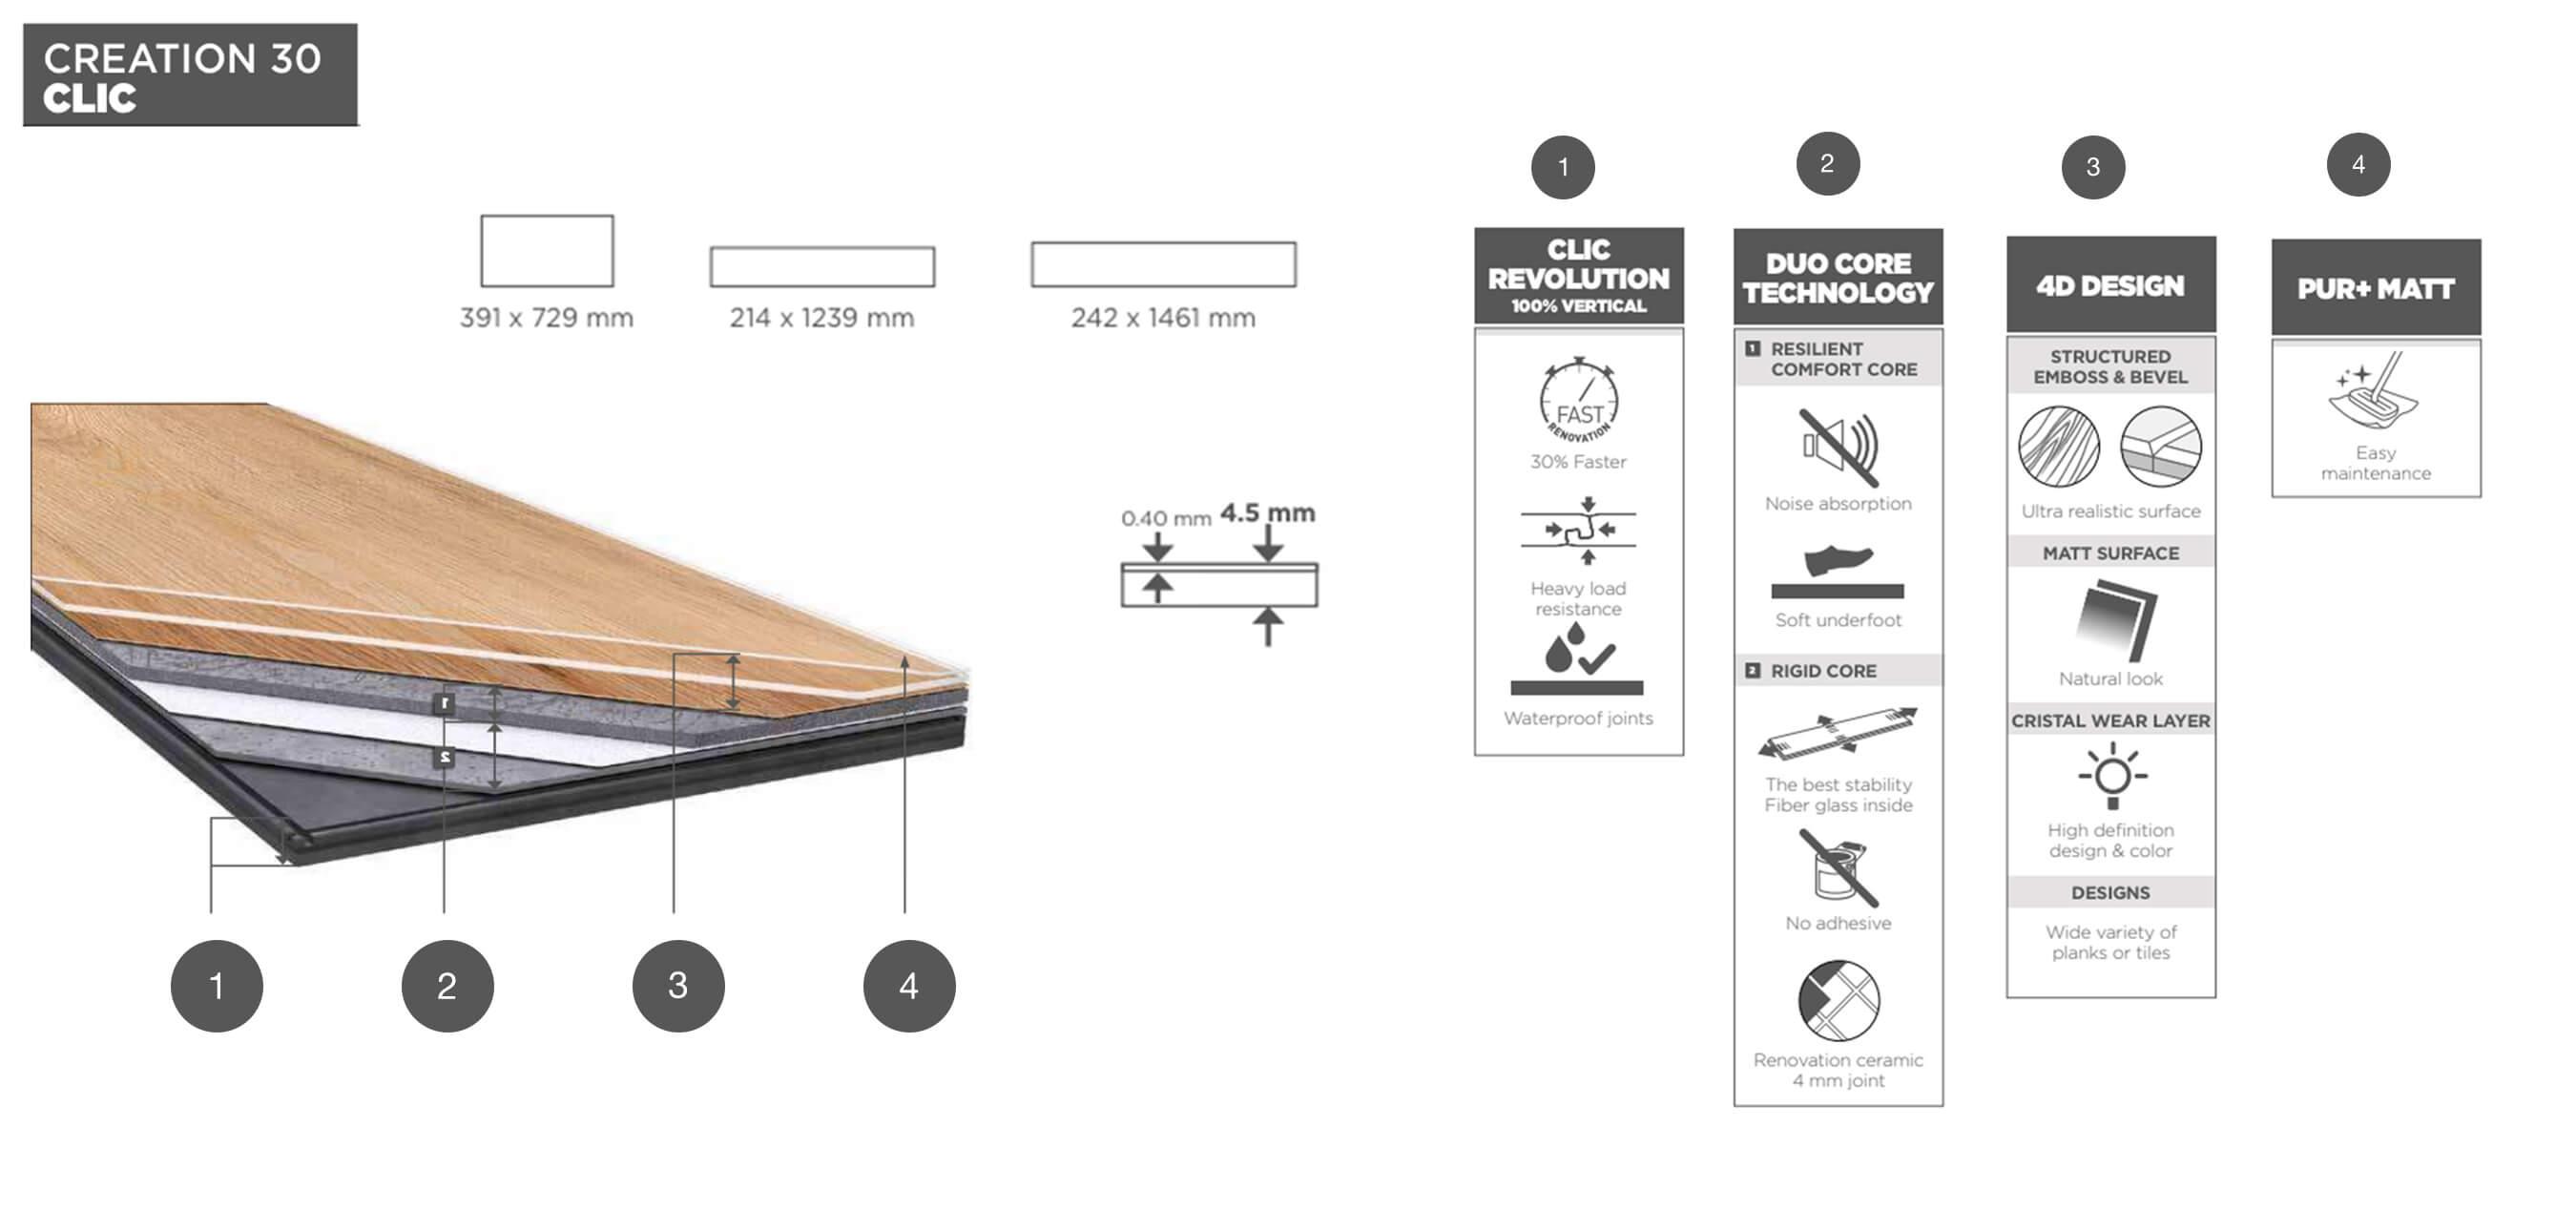 gerflor-creation-30-clic-pavimento-lvt-struttura